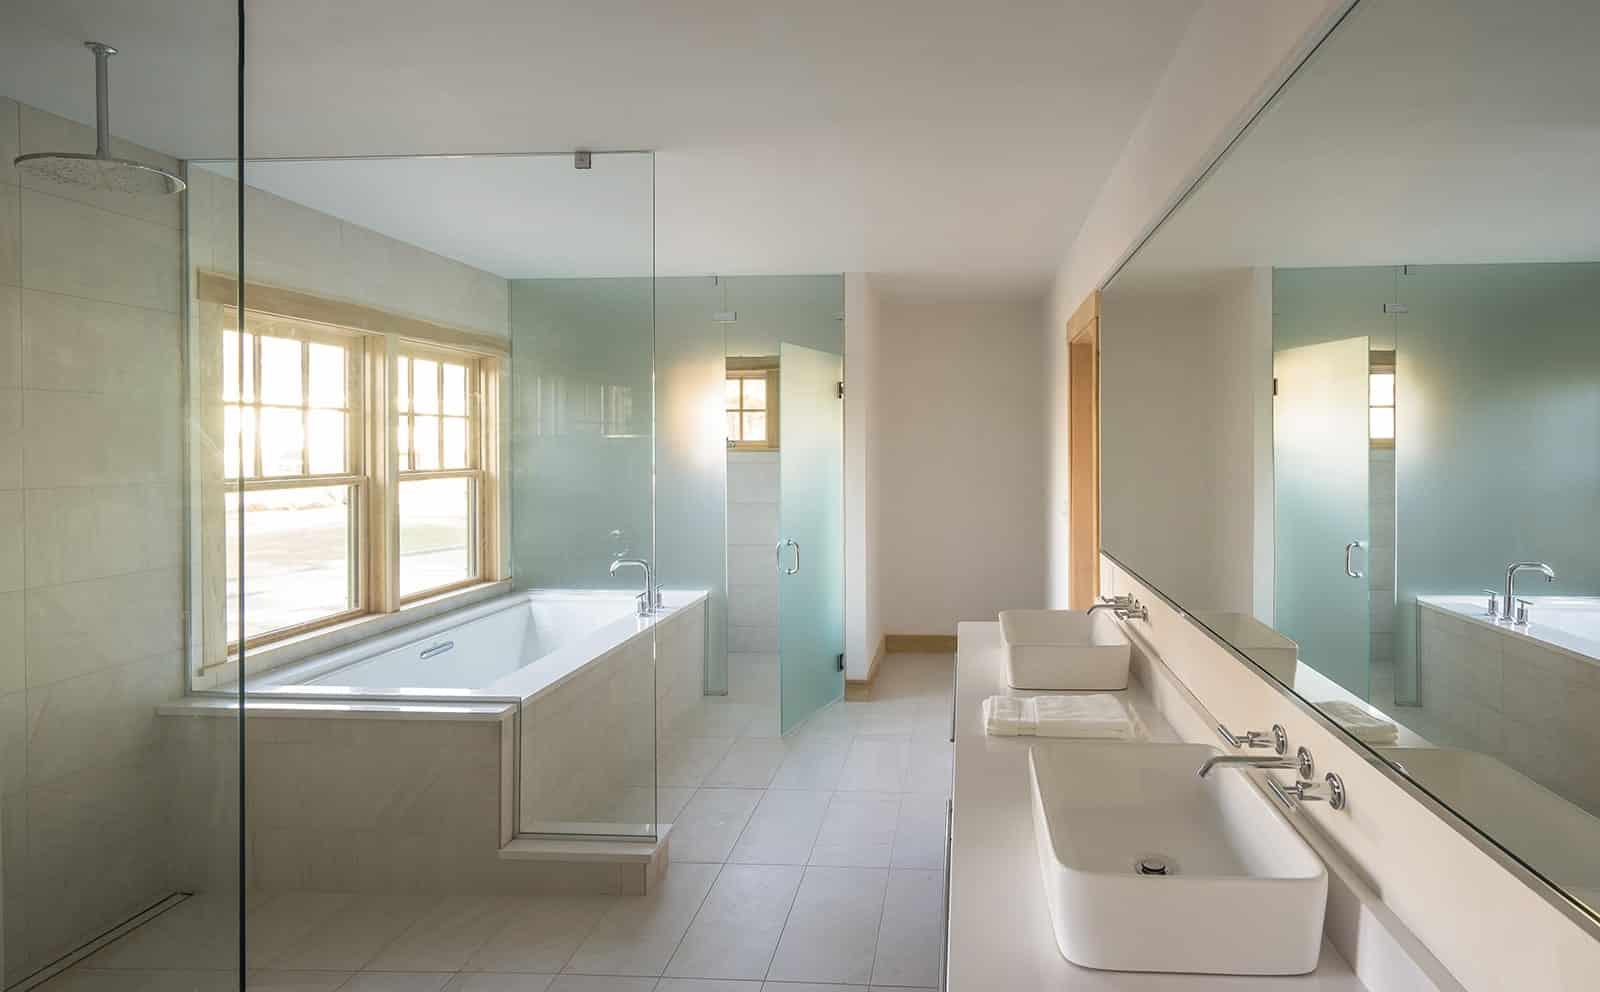 Contemporary Retreat Interiors Ipswich MA Bathroom